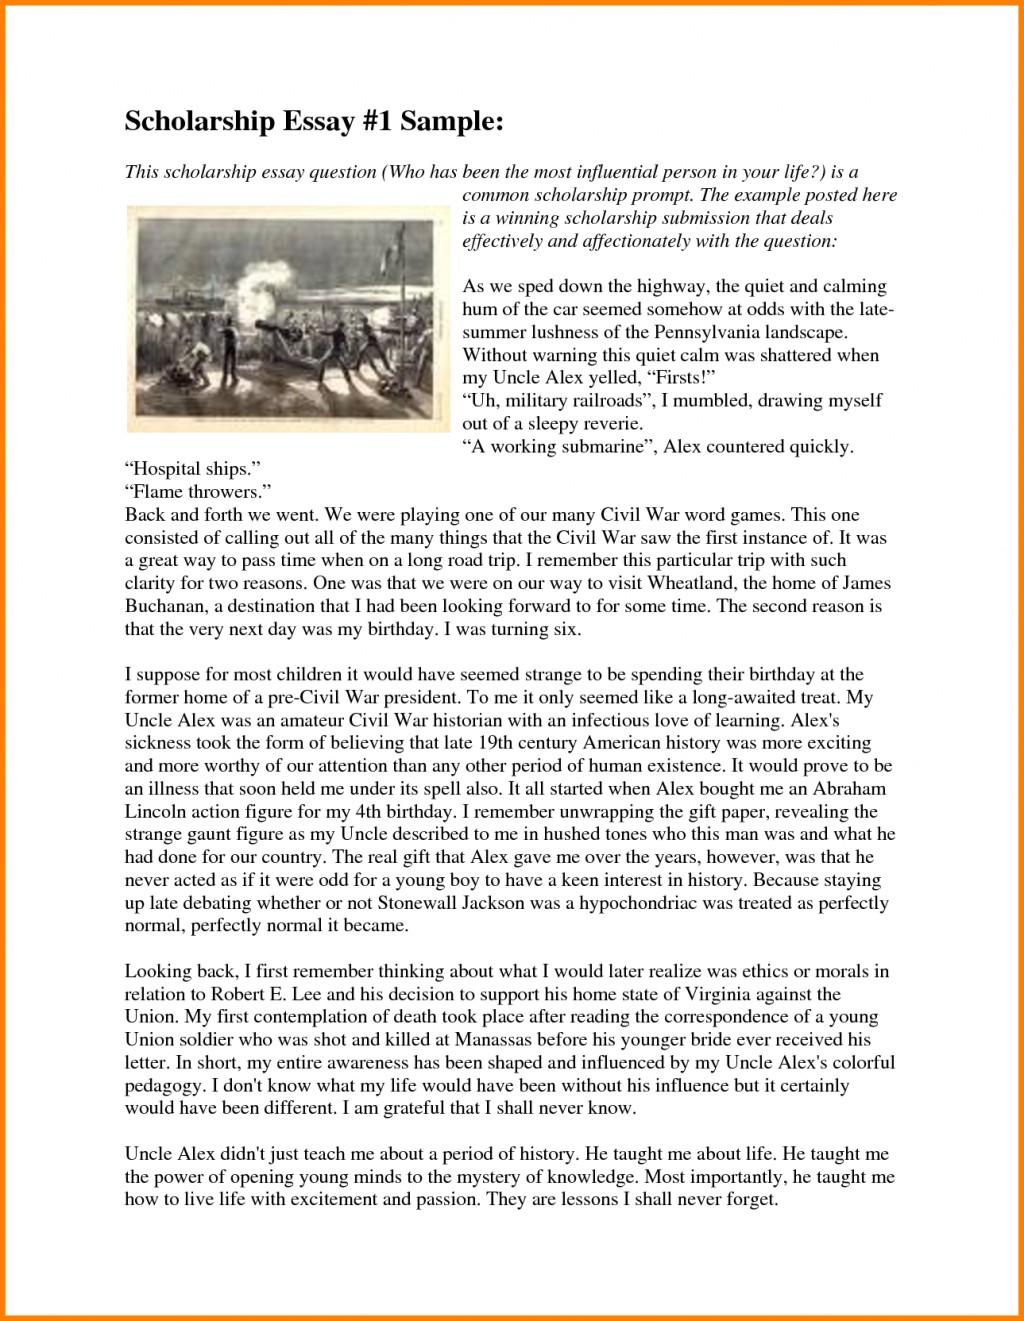 006 Essay Example Winning Scholarship Examples College Fix Ablez Exa Nursing Award Stupendous Pdf Large